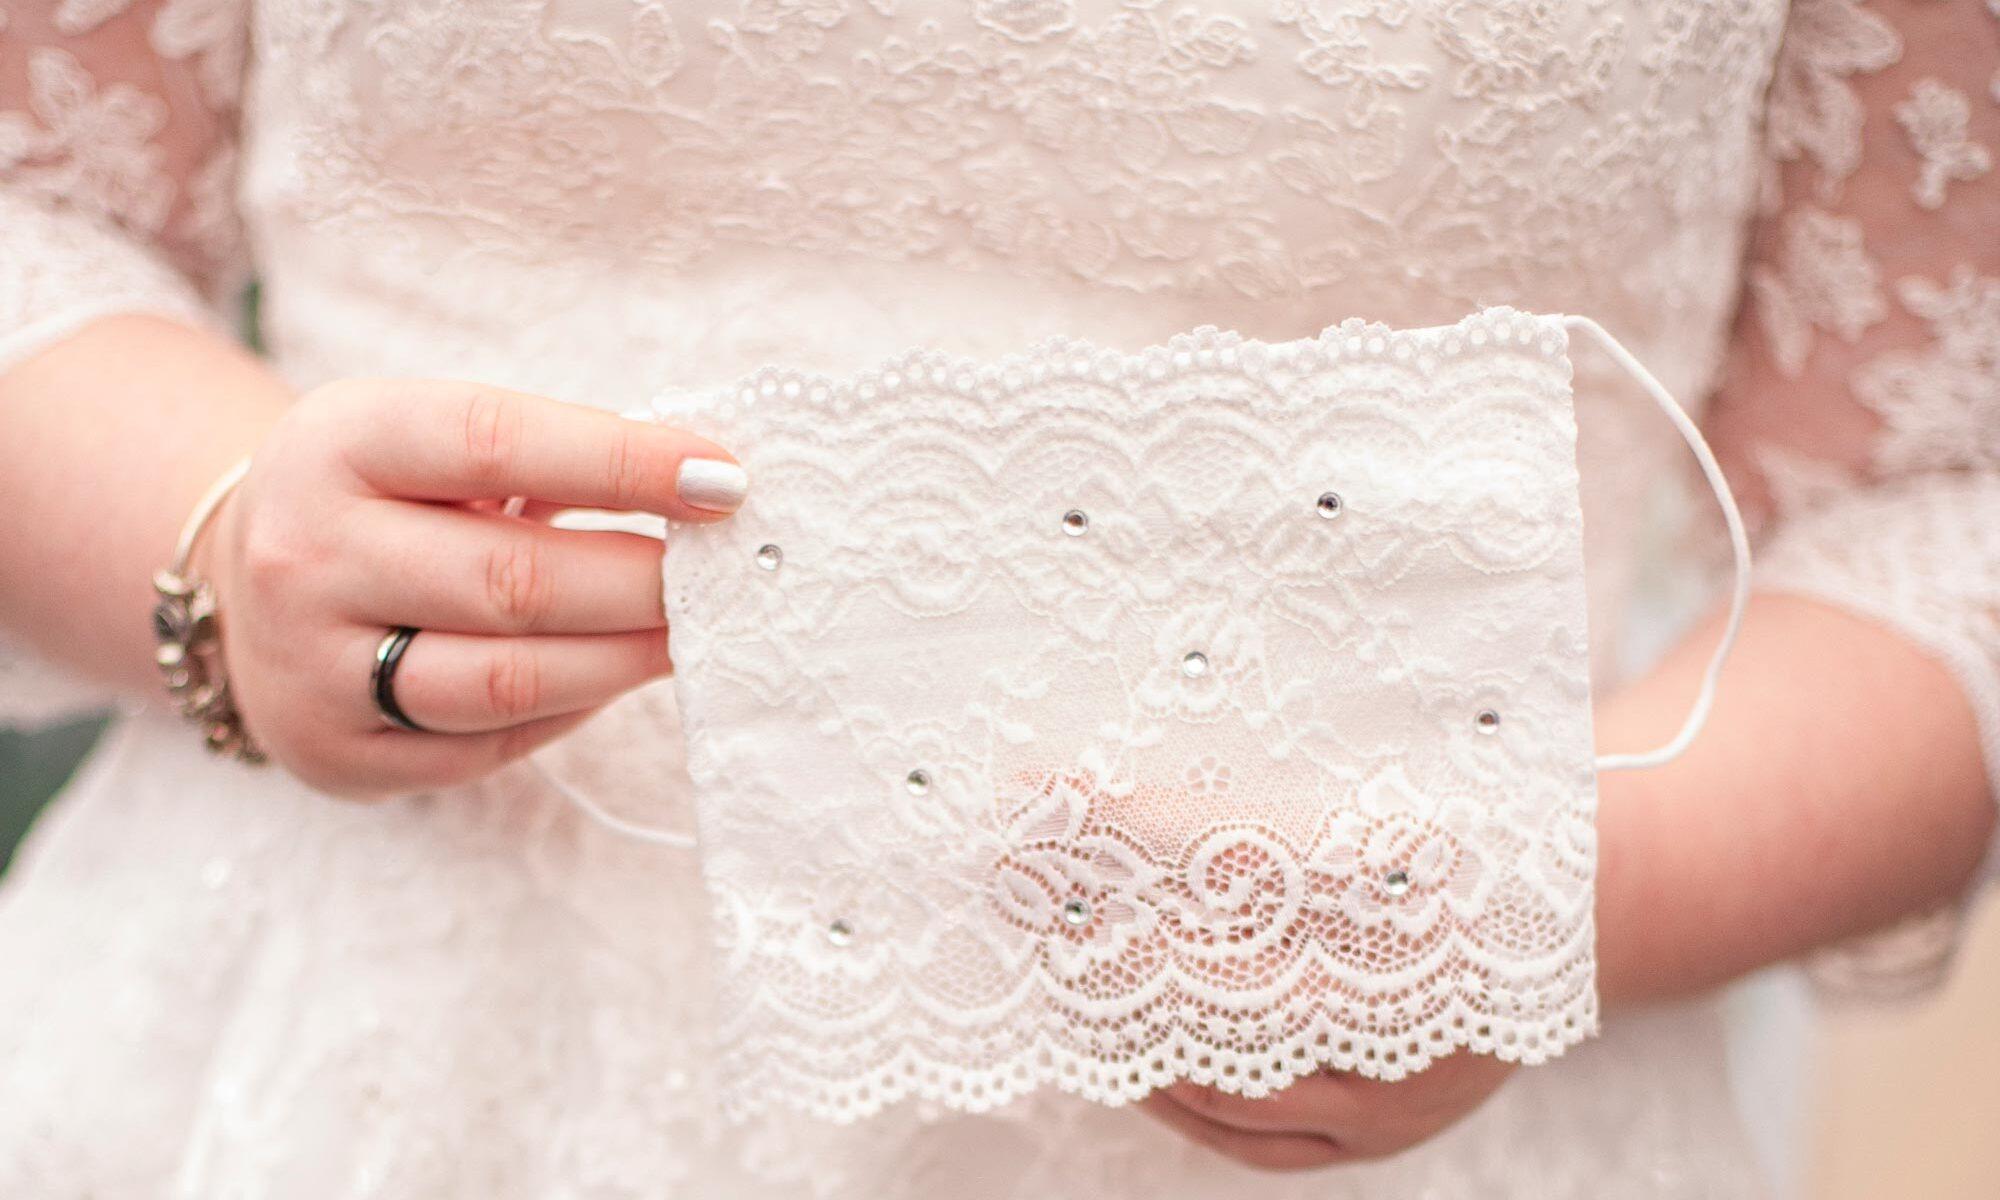 Bruiloft in corona tijd coronamaatregelen